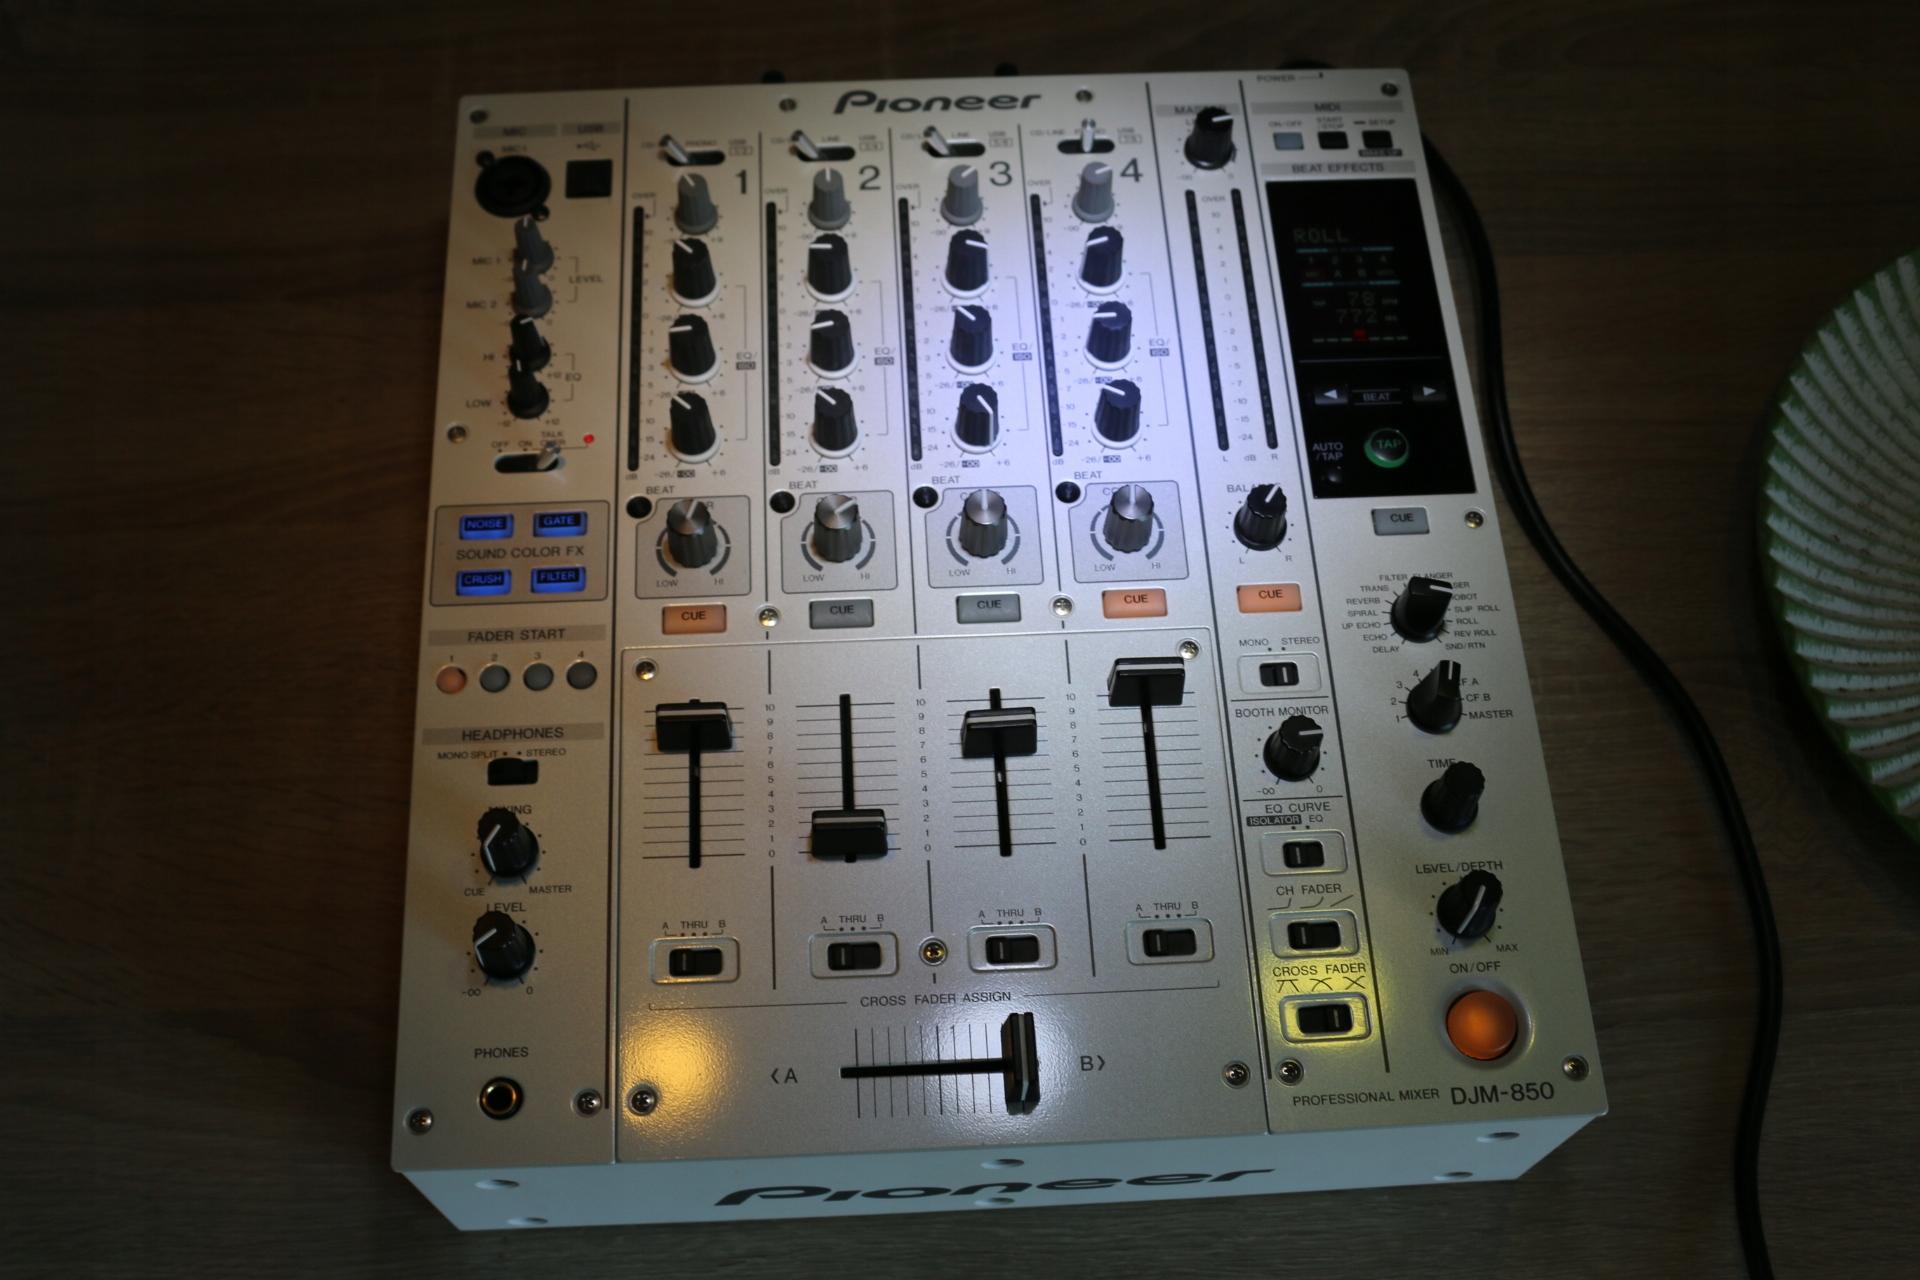 Pioneer DJM 850 Biały jak 800 700 djm850